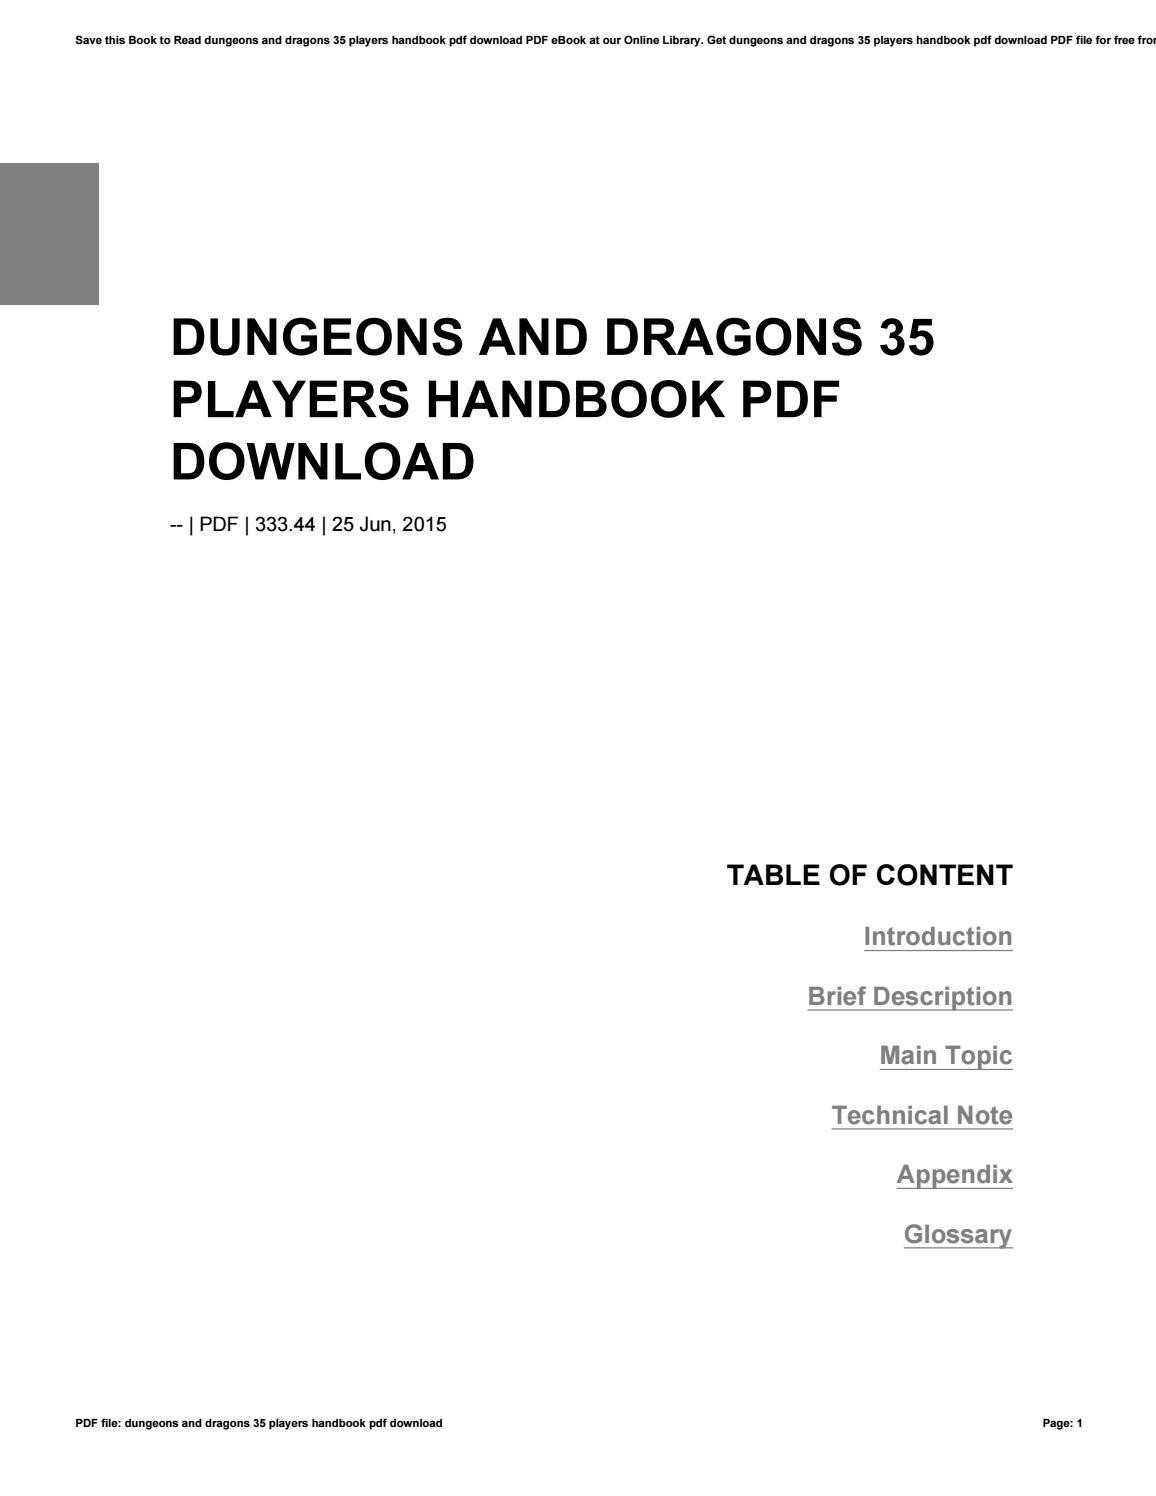 Players Handbook 35 Pdf